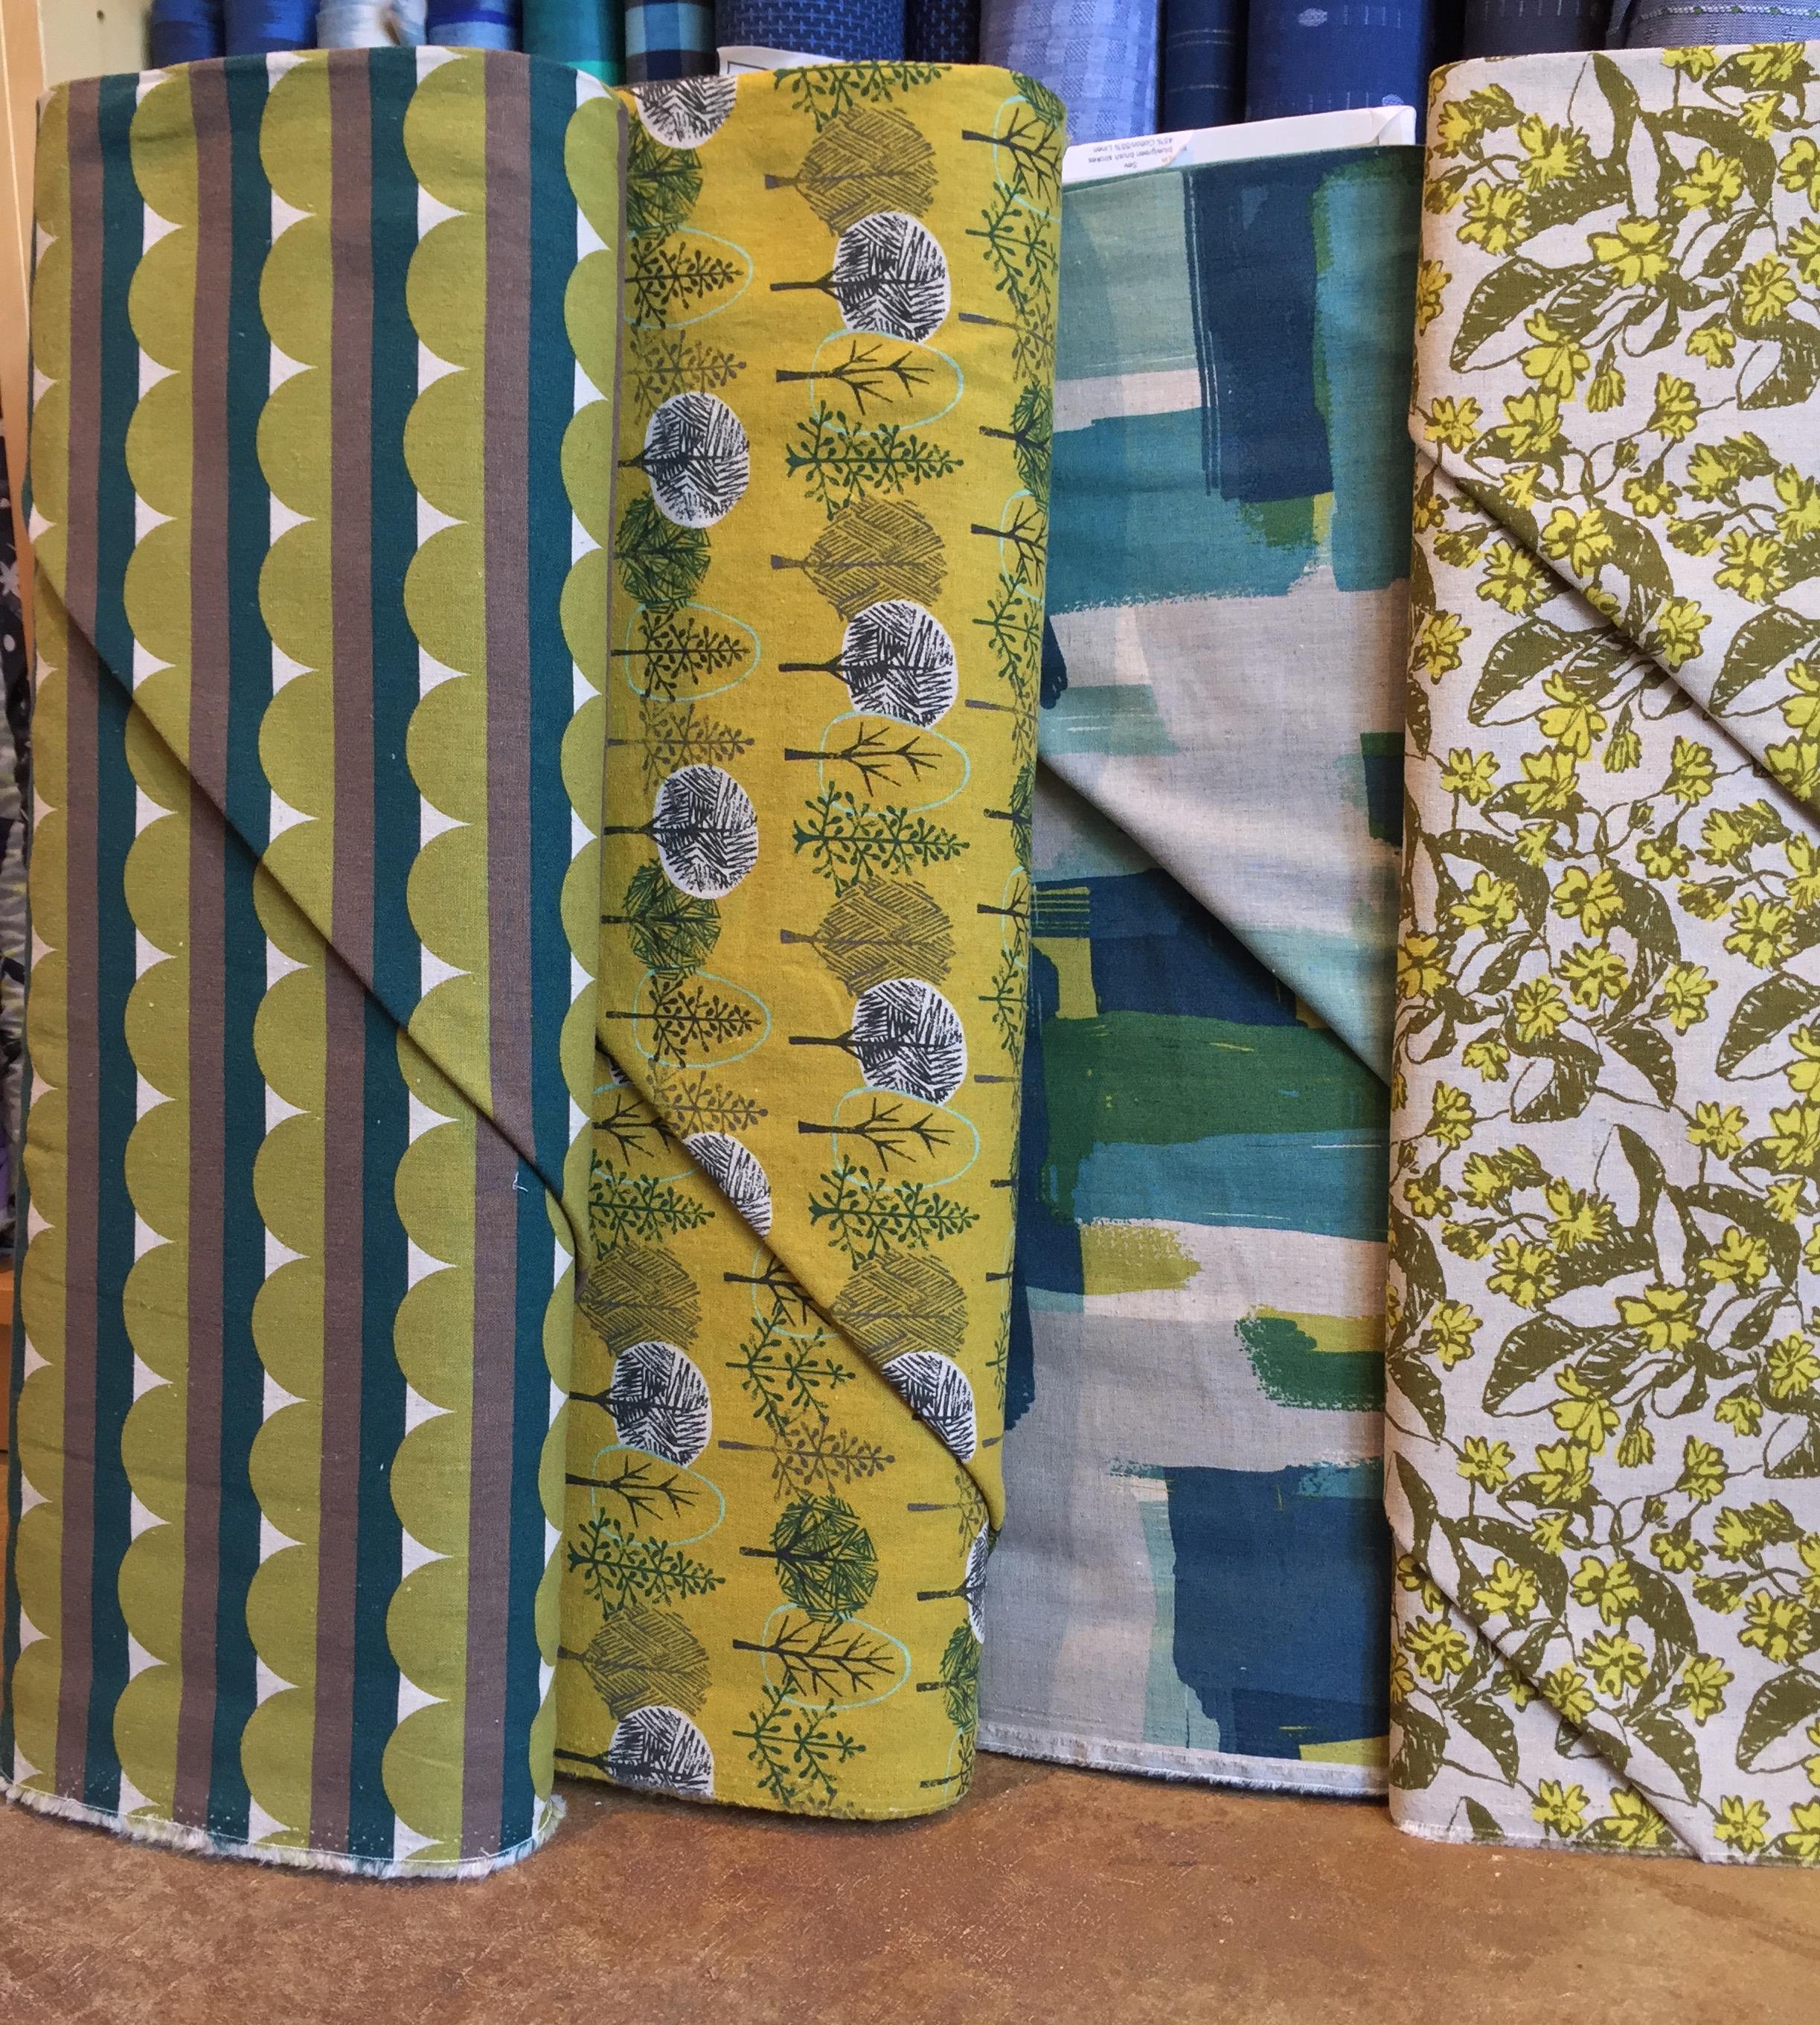 midweight cotton linen blends in a cool green blue yellow palette.